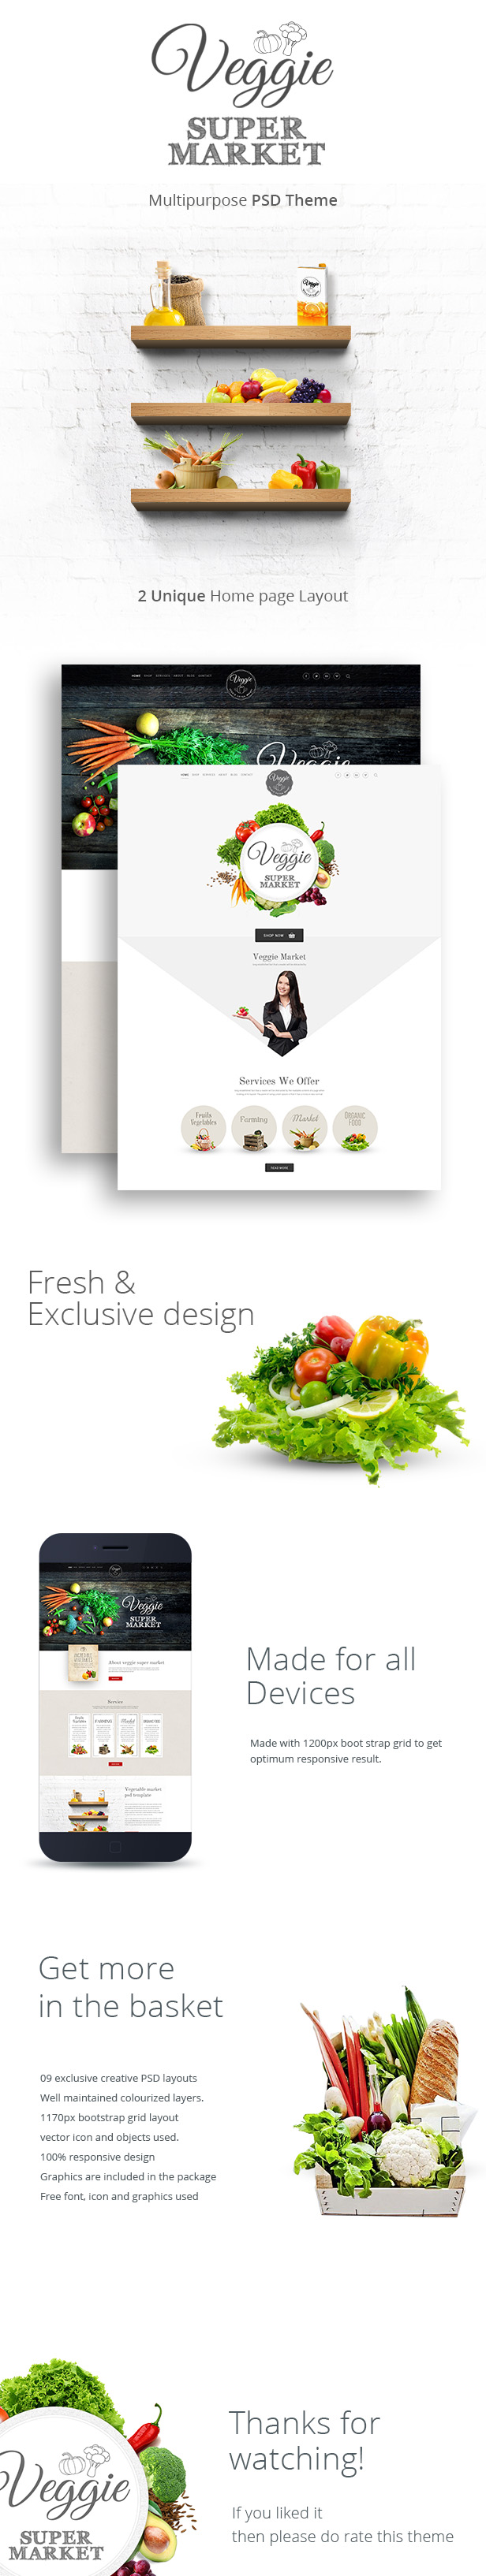 Veggie Super Market | Multipurpose PSD Template - 2